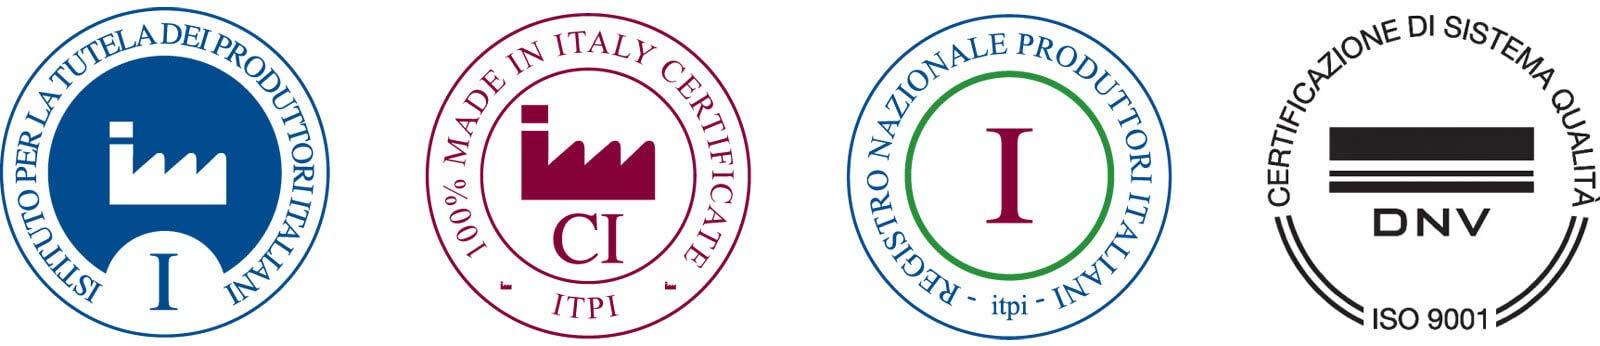 margaroli-certificazioni